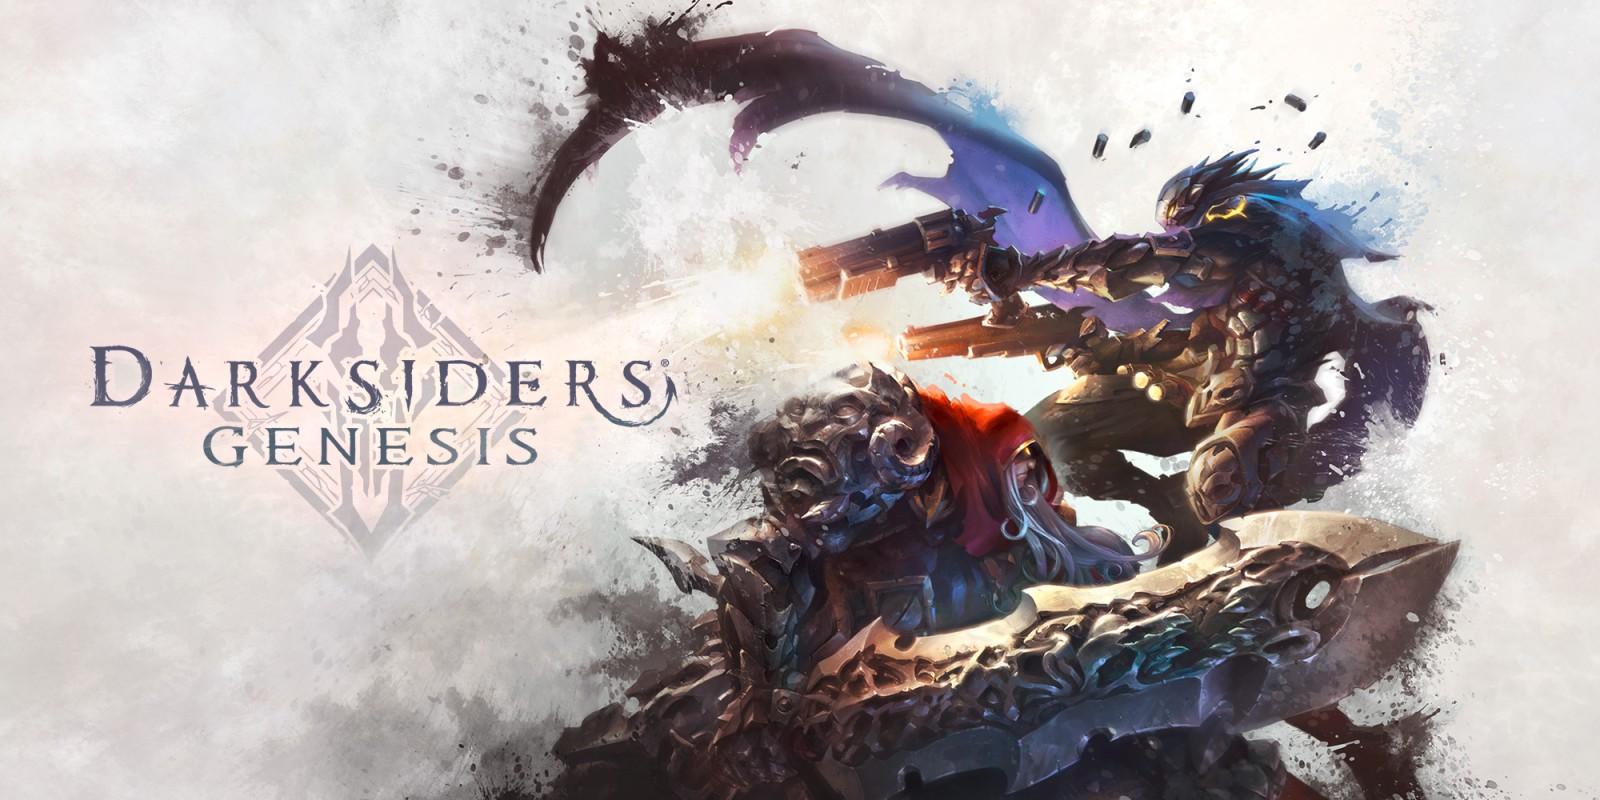 [Review] Darksiders Genesis no Nintendo Switch 4